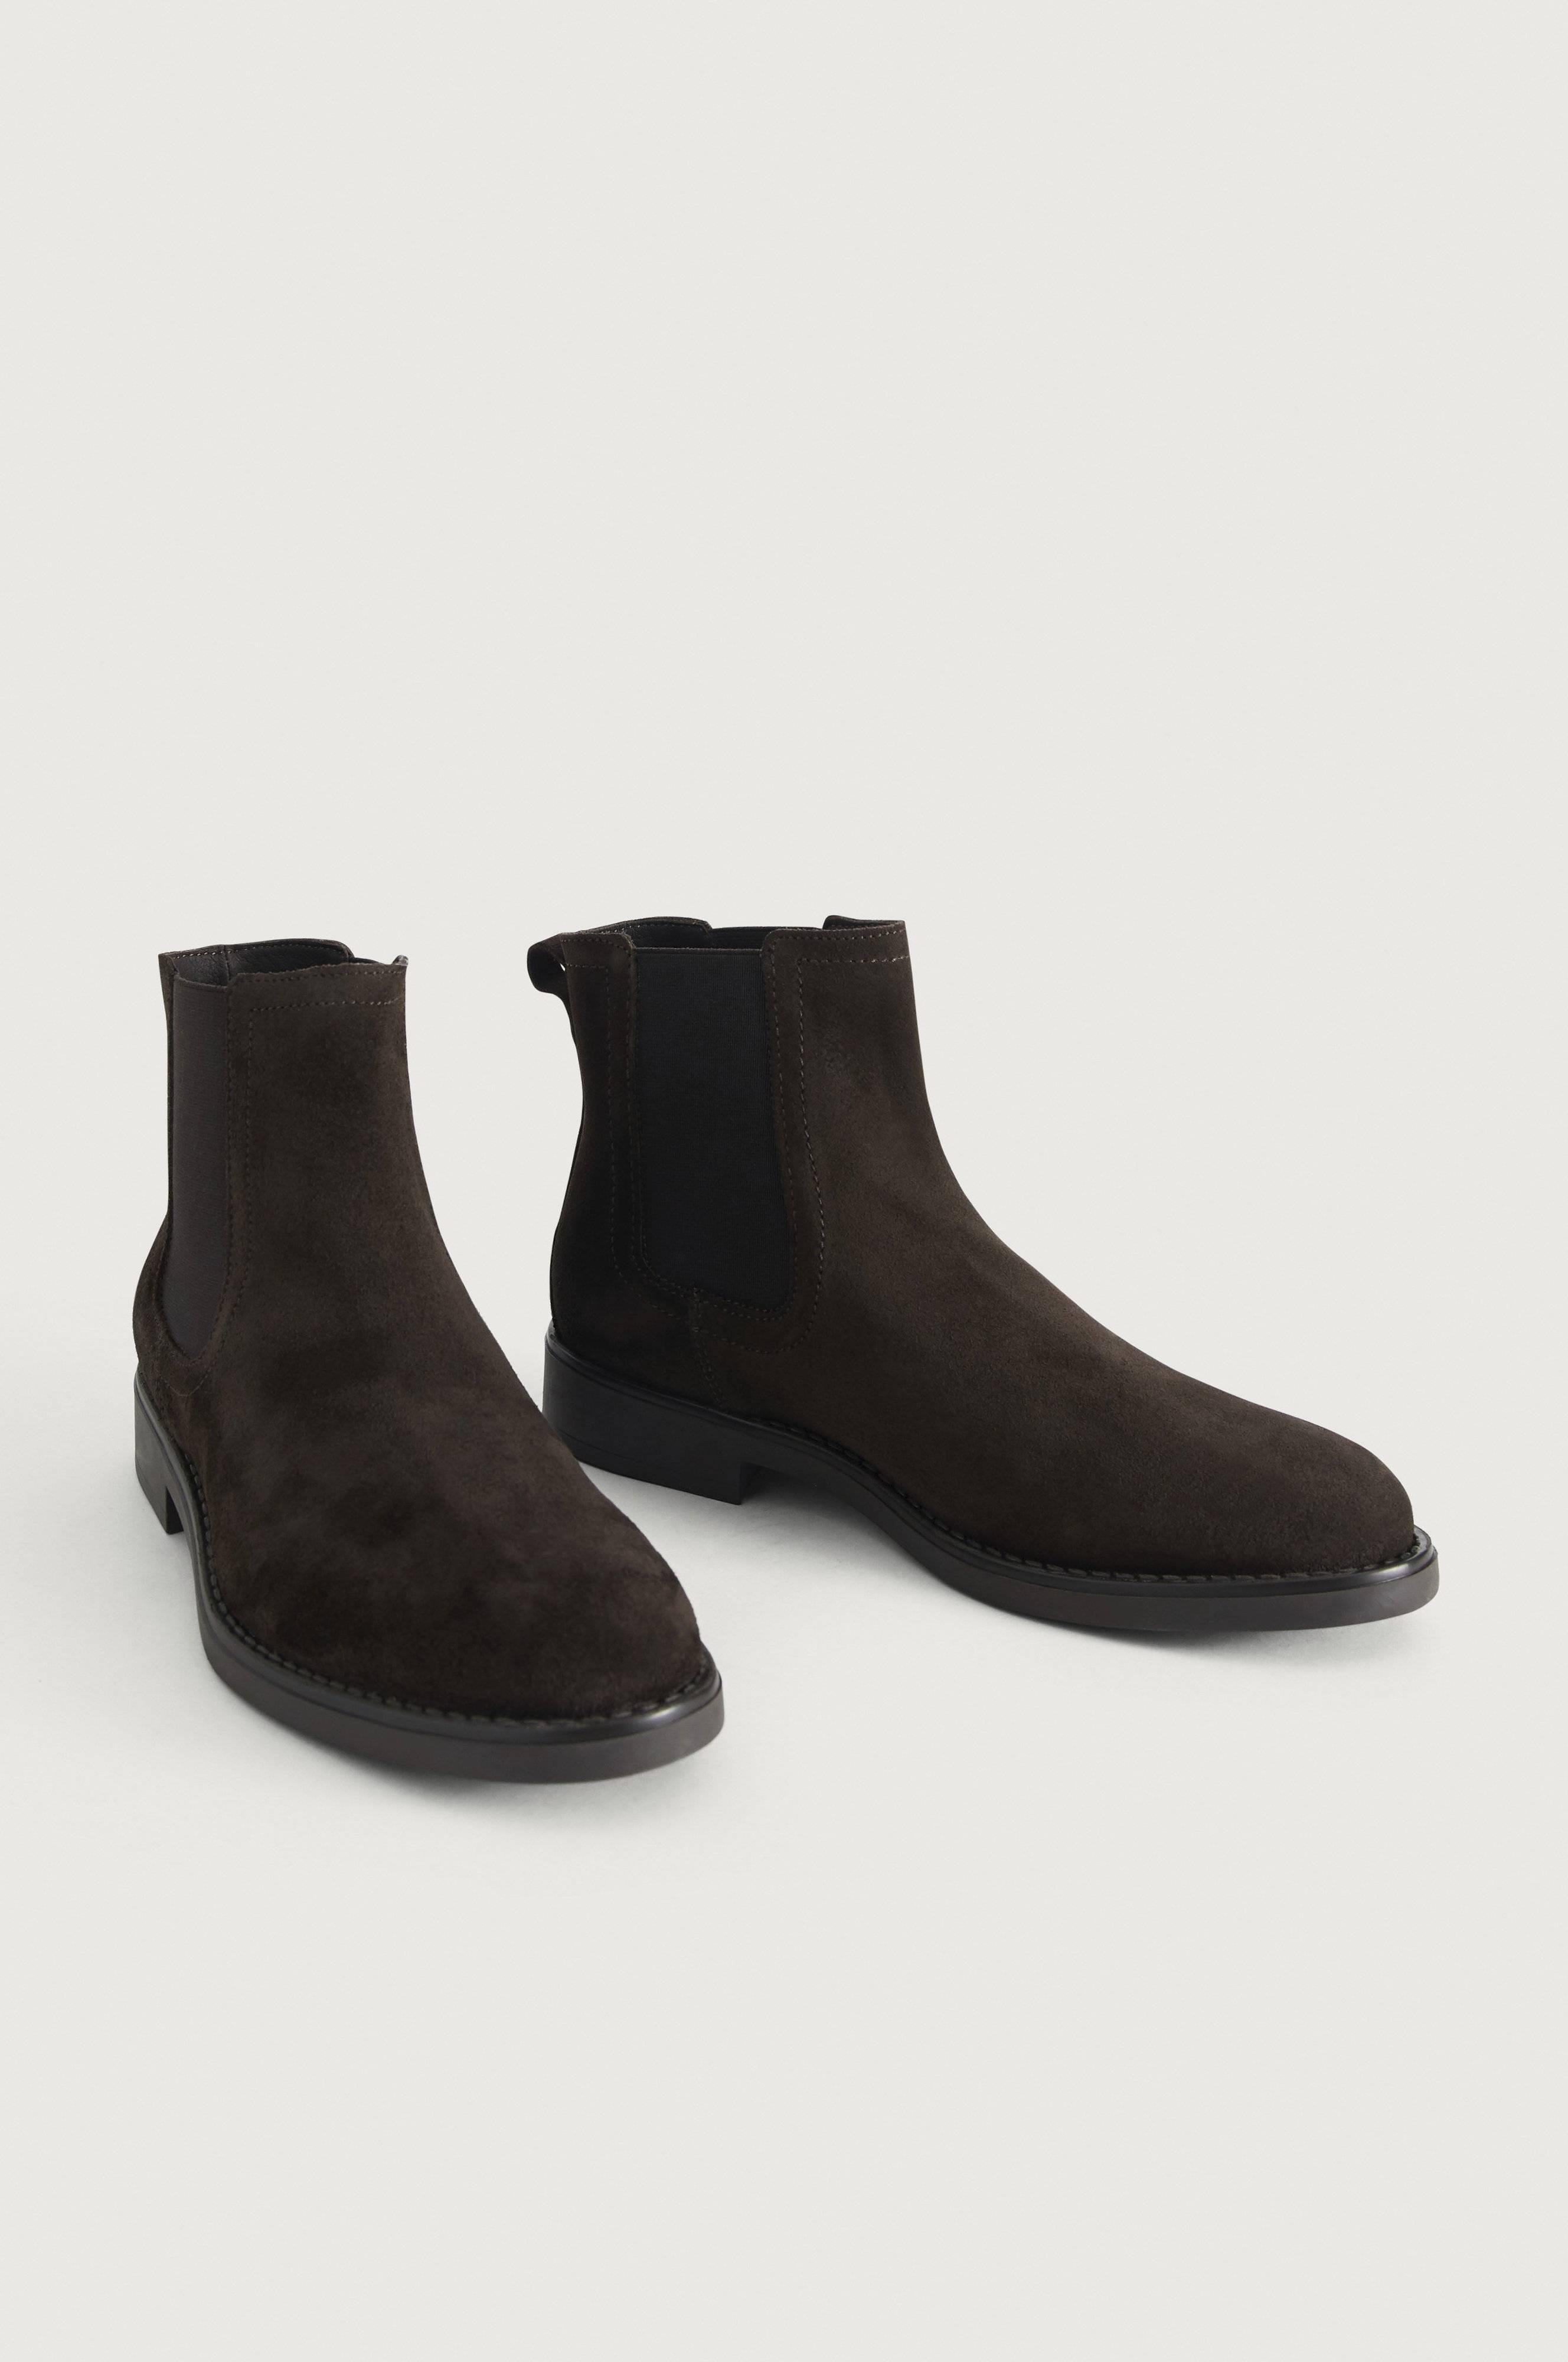 Studio Total Chelsea Boots